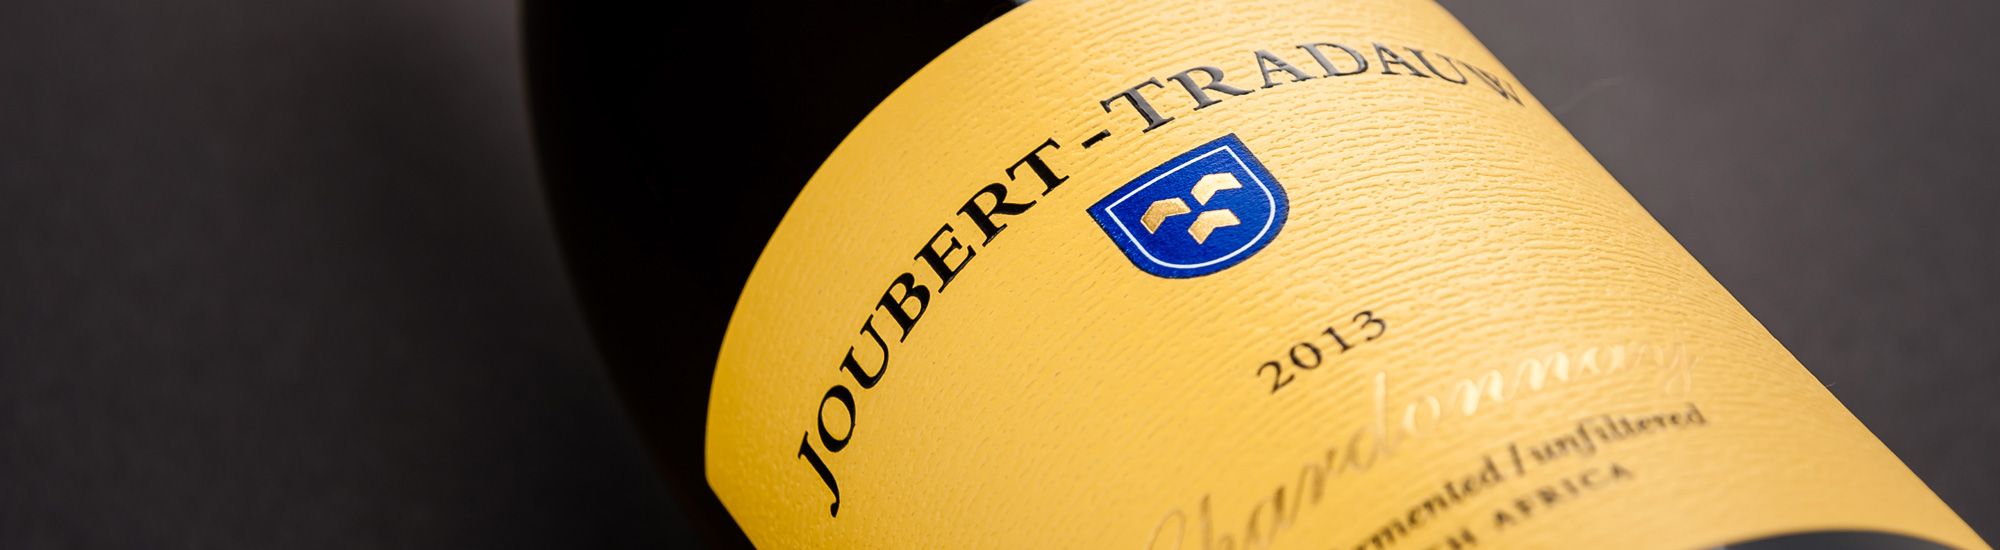 Wine Slider 007